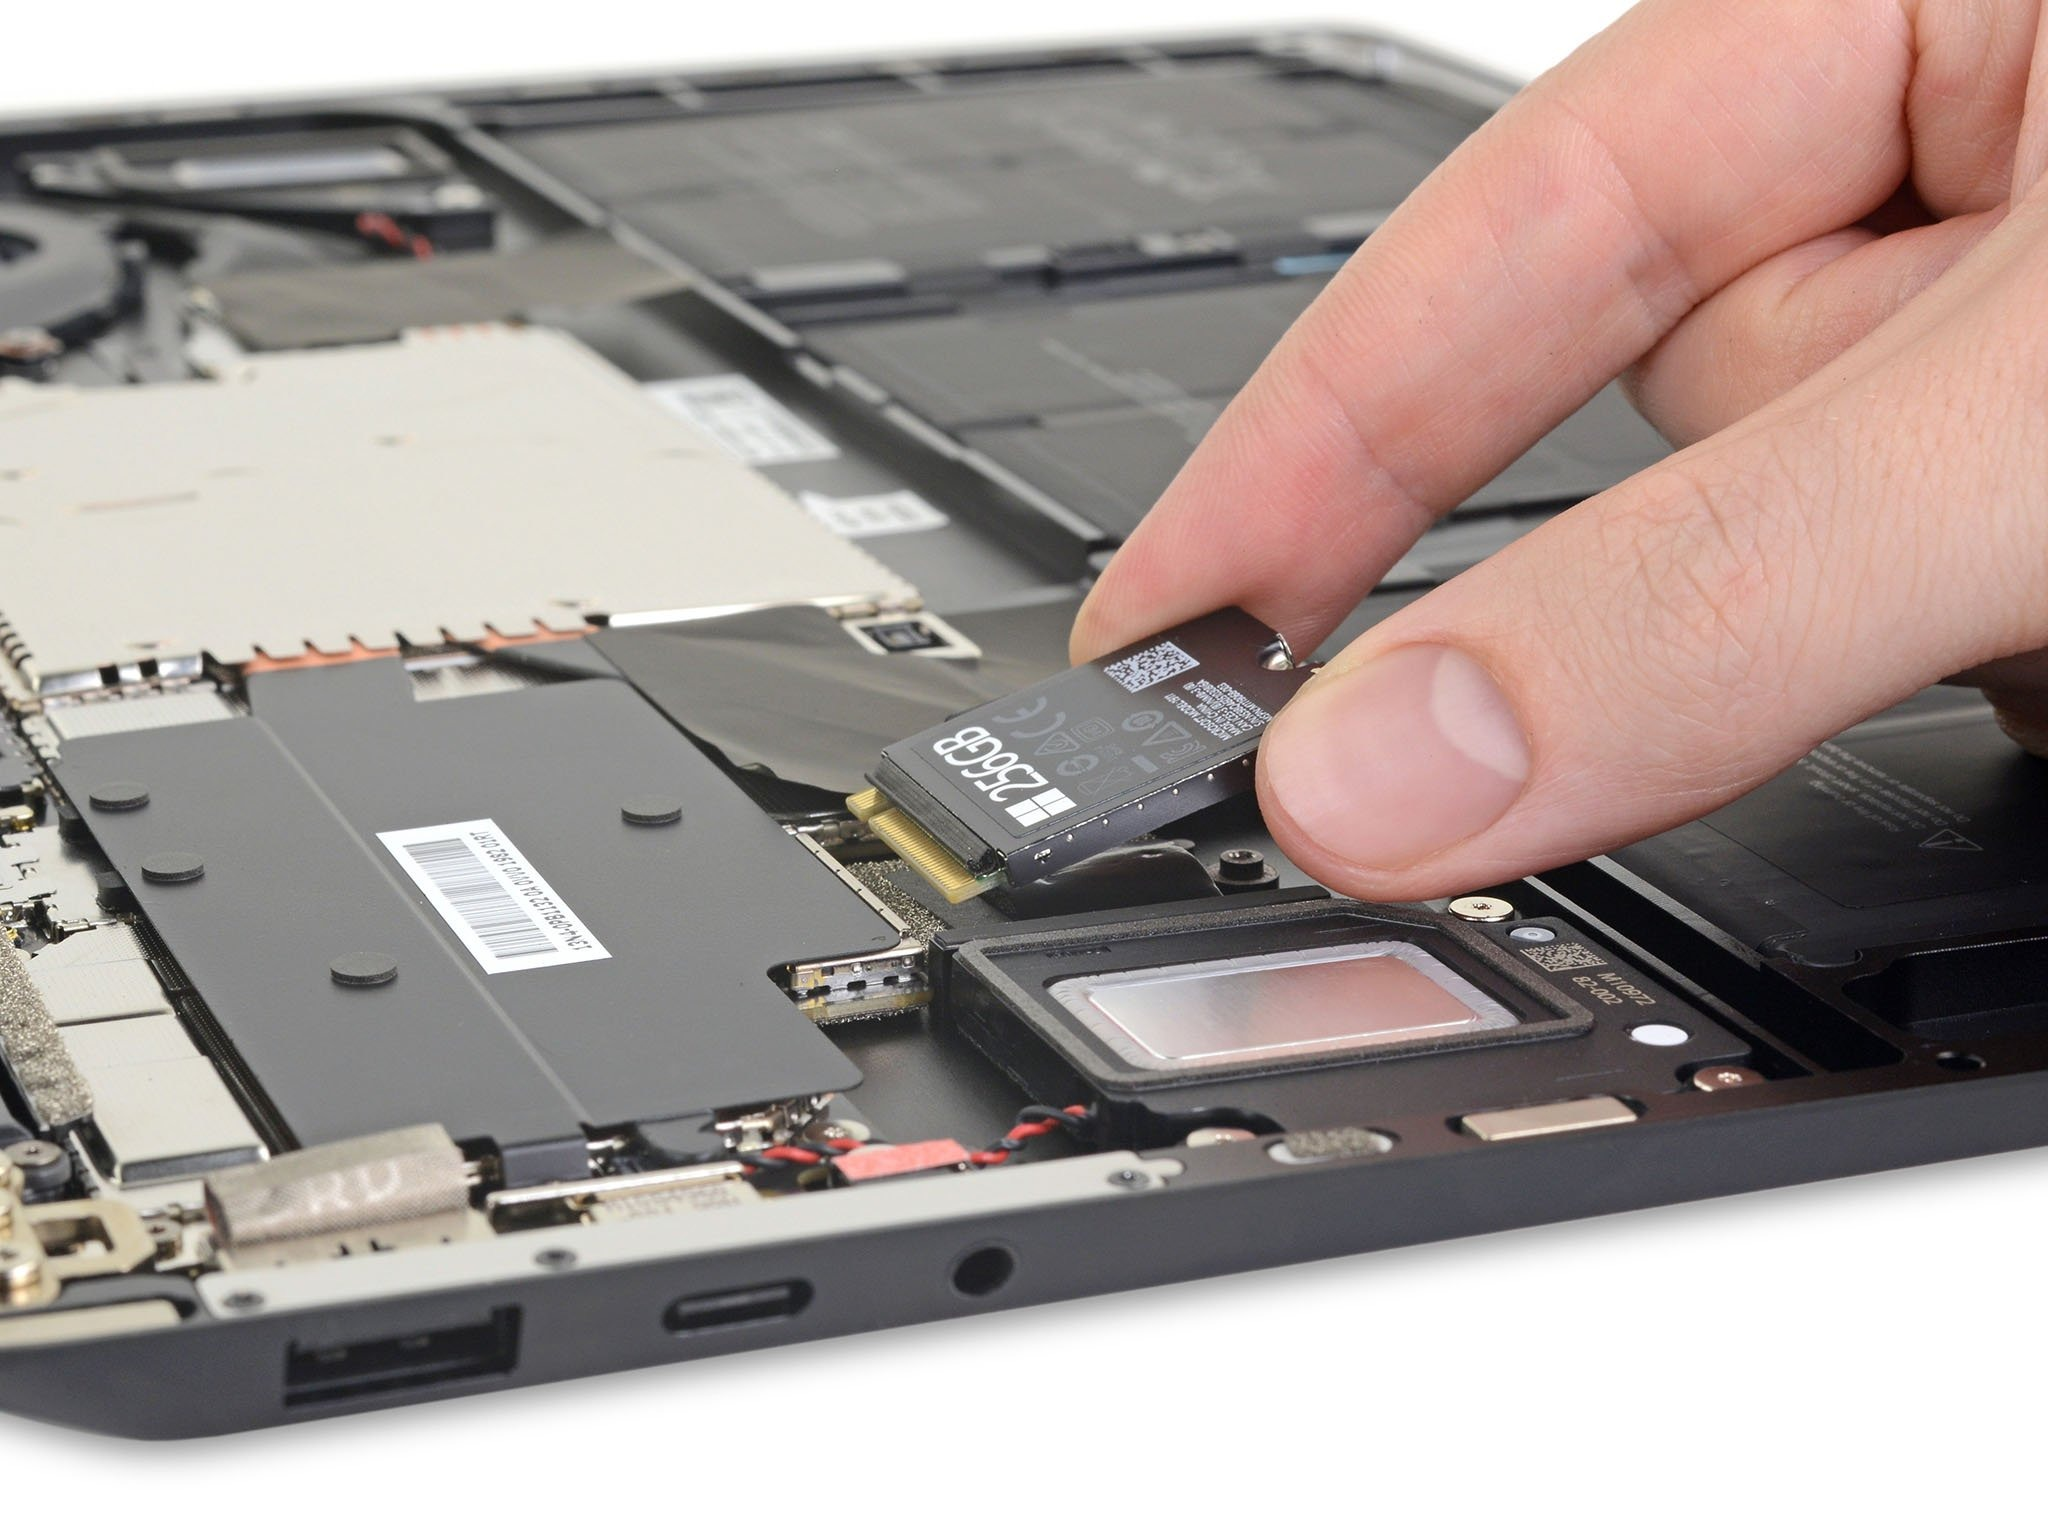 sua-surface-laptop-3-nay-that-de-dang7